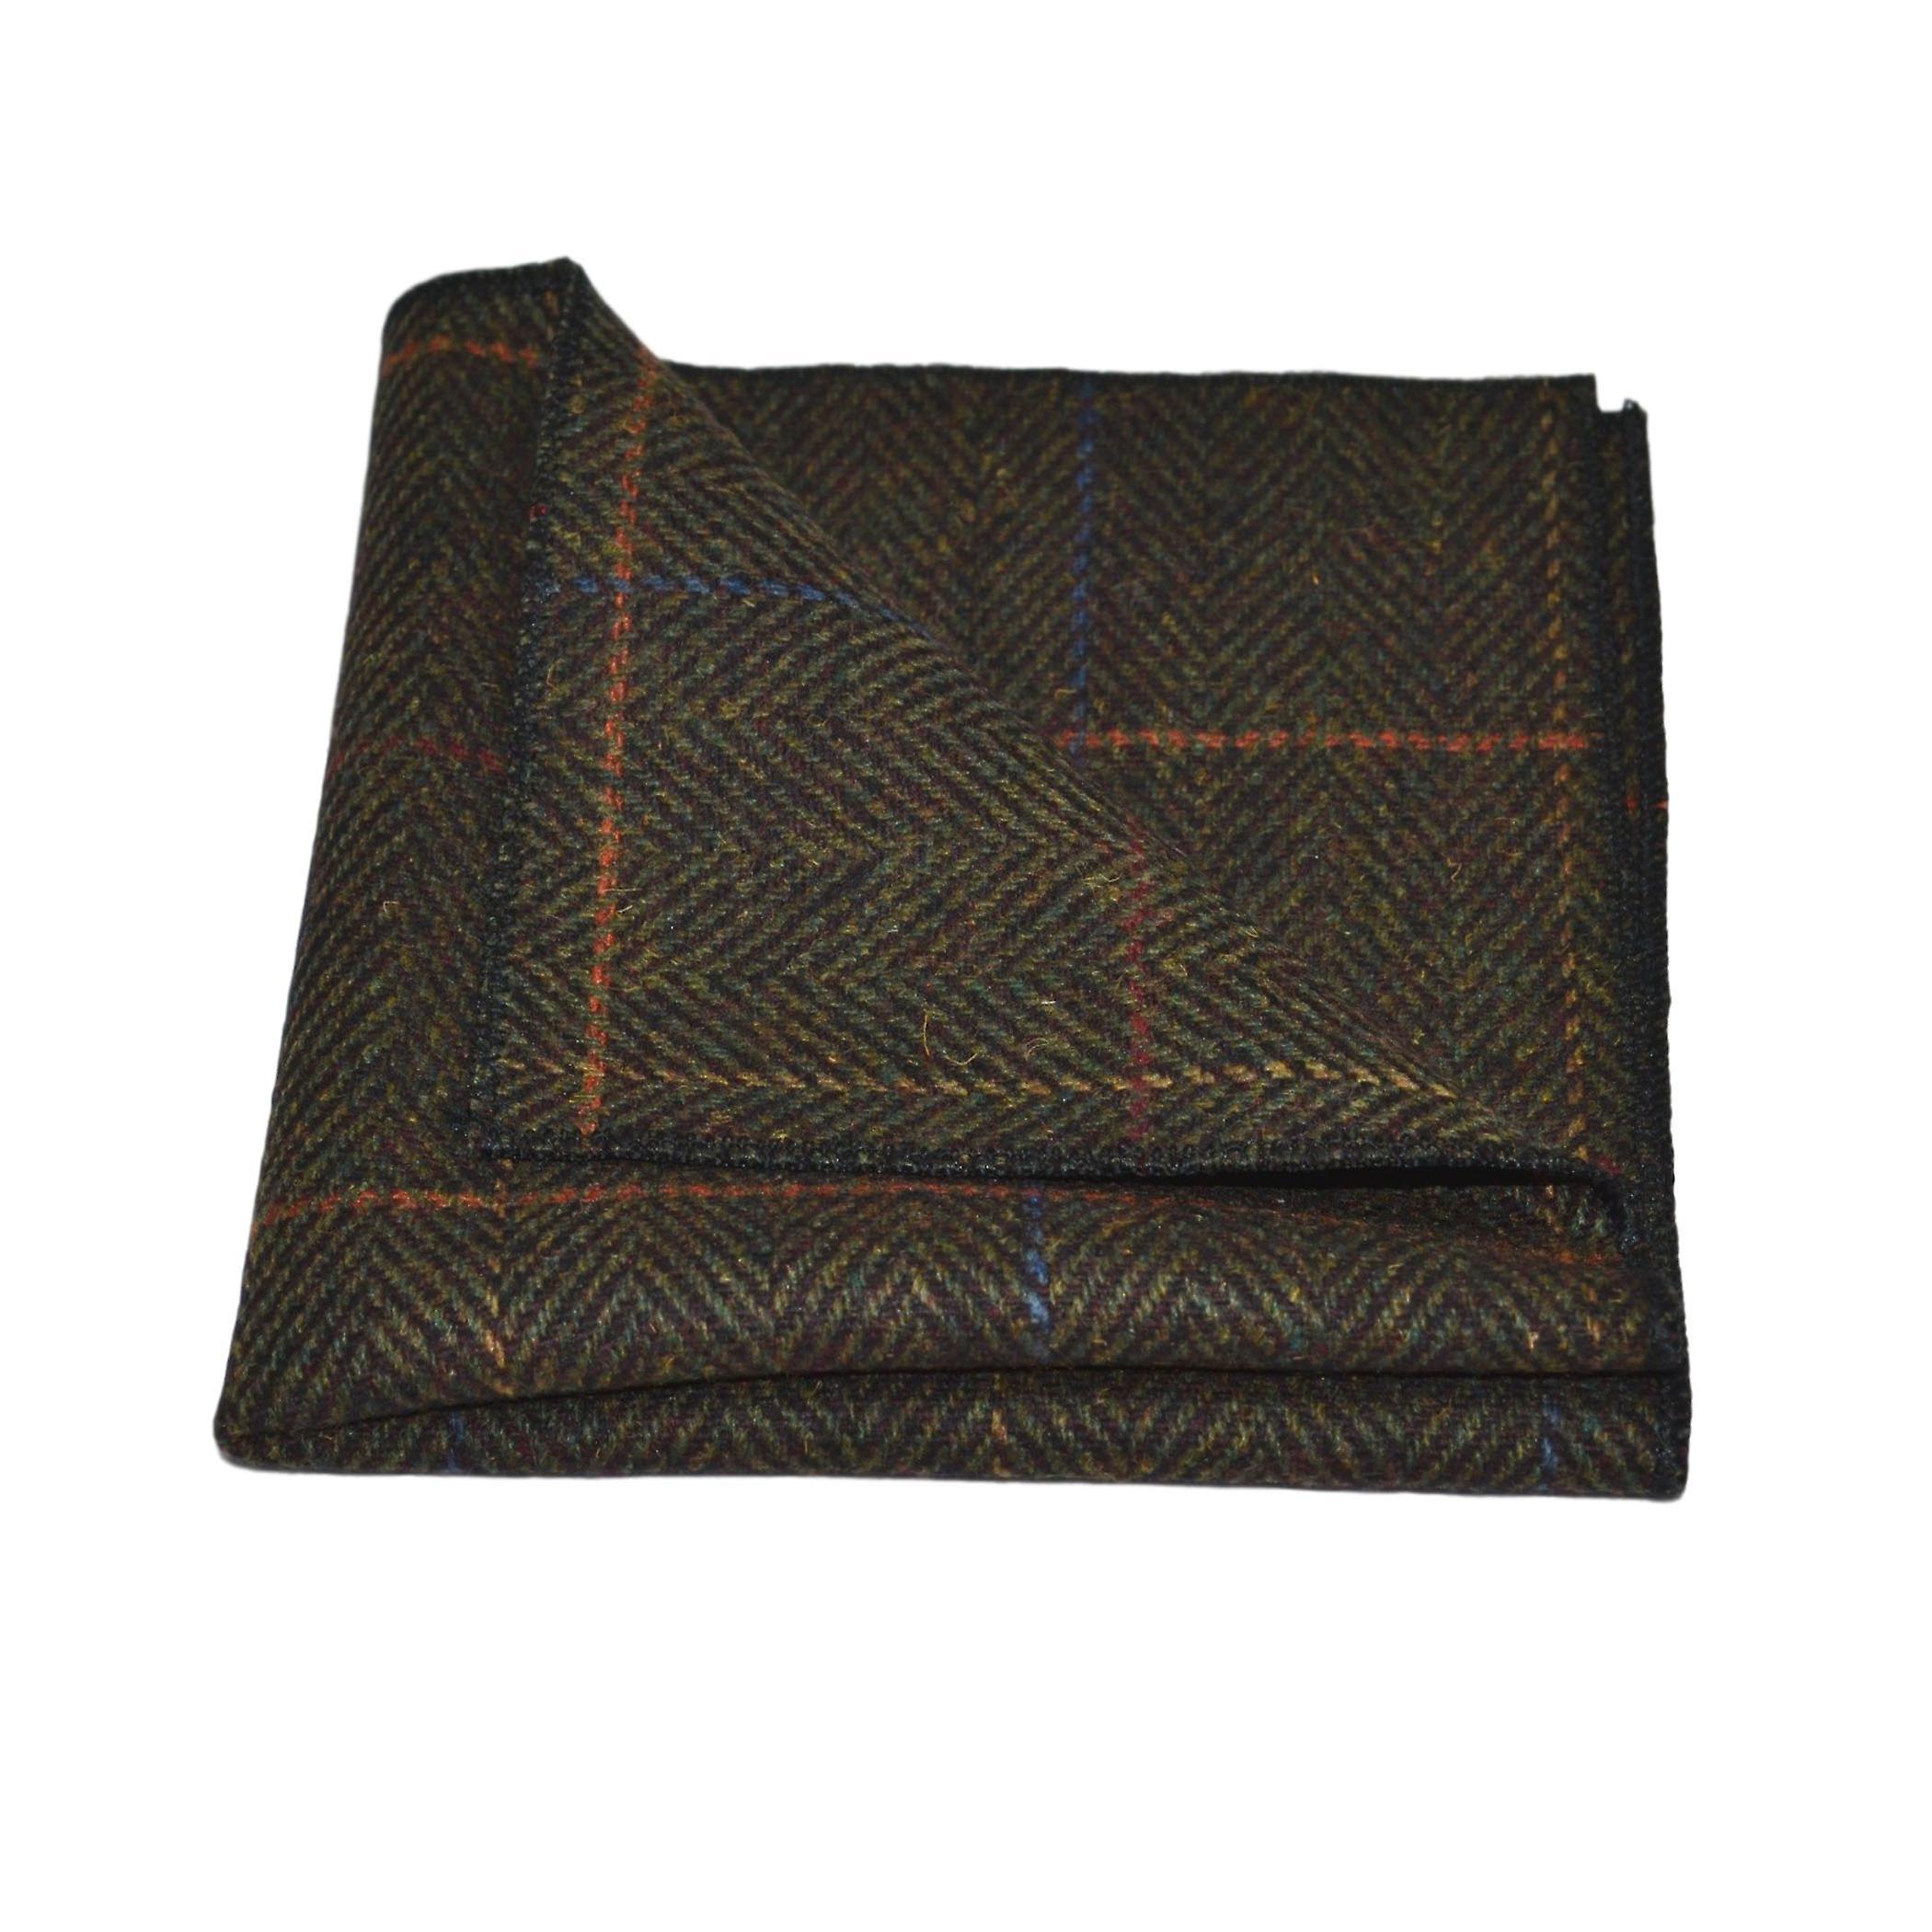 Luxury Mahogany Herringbone Check Tie & Pocket Square Set, Tweed